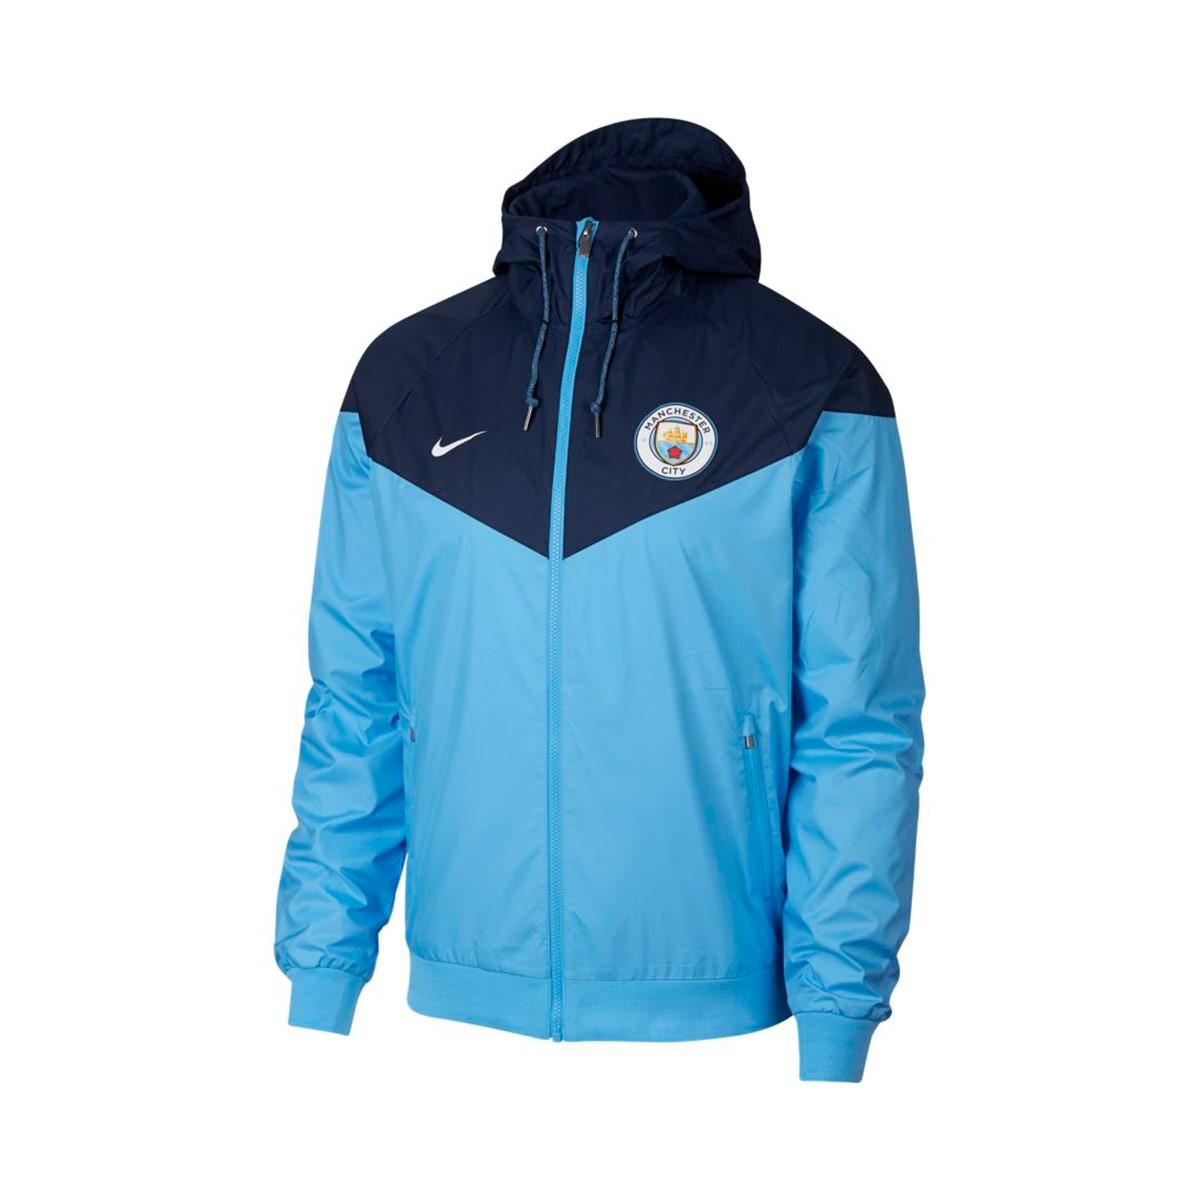 48e7a75de8c4 Nike Manchester City FC Windrunner 2018-2019 Jacket. Field blue-Midnight  navy-White ...